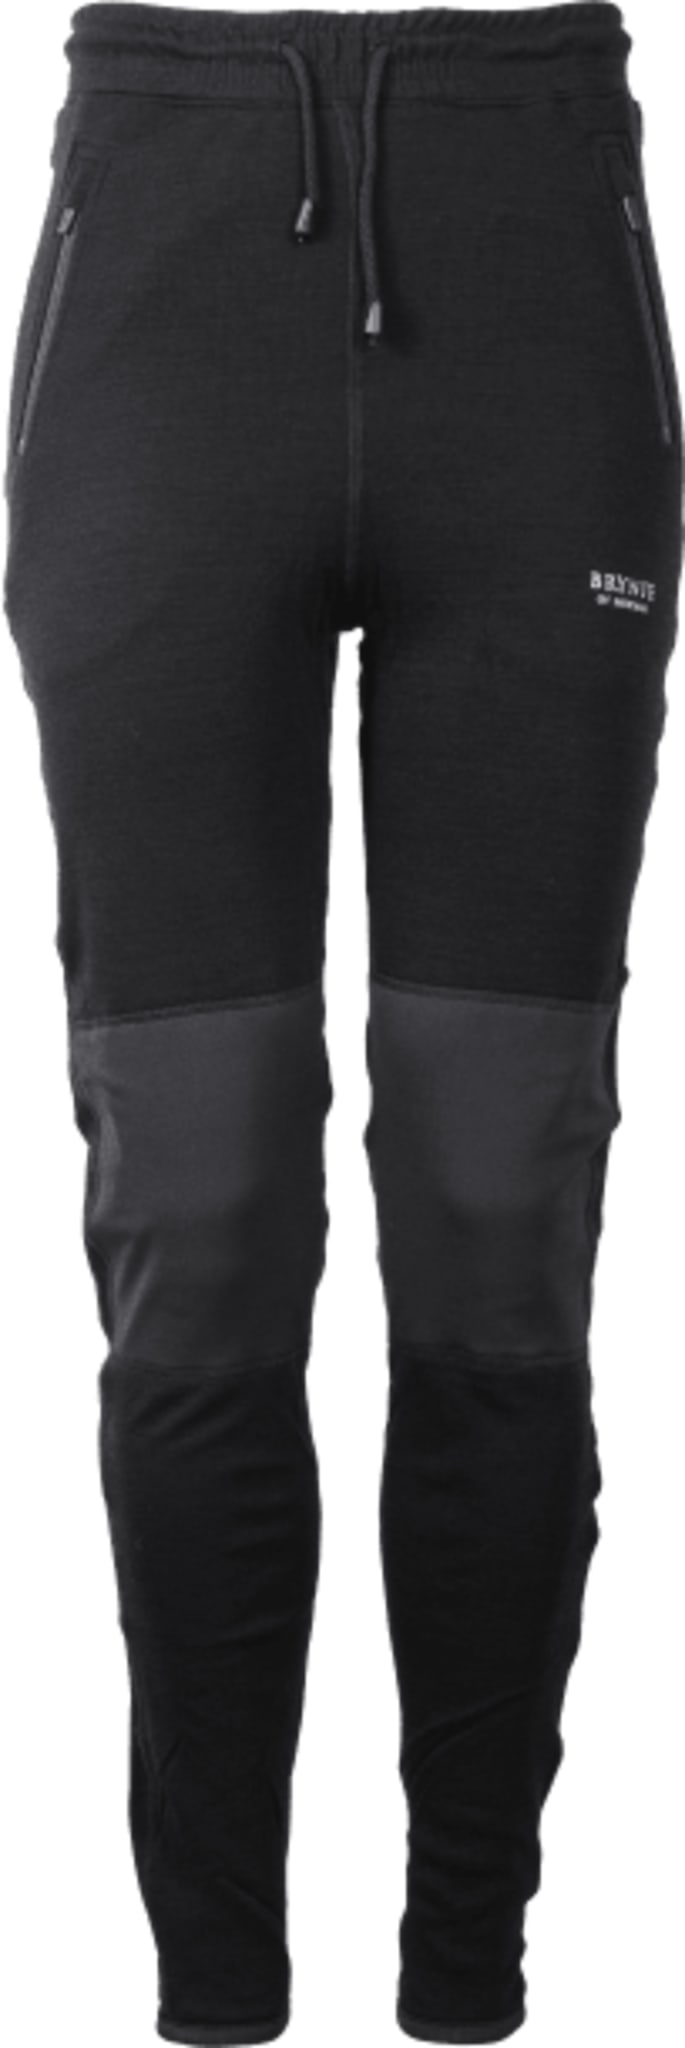 Antarctic Pants